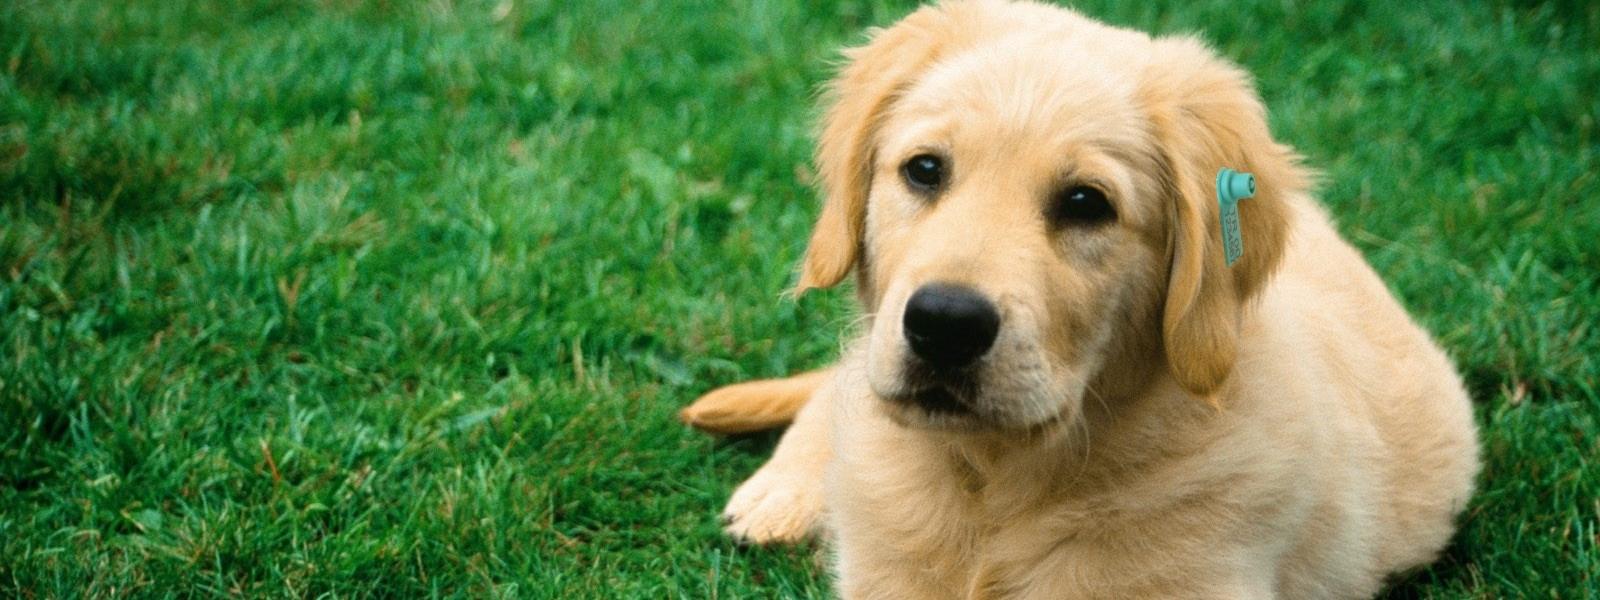 stray-animals-ear-tag